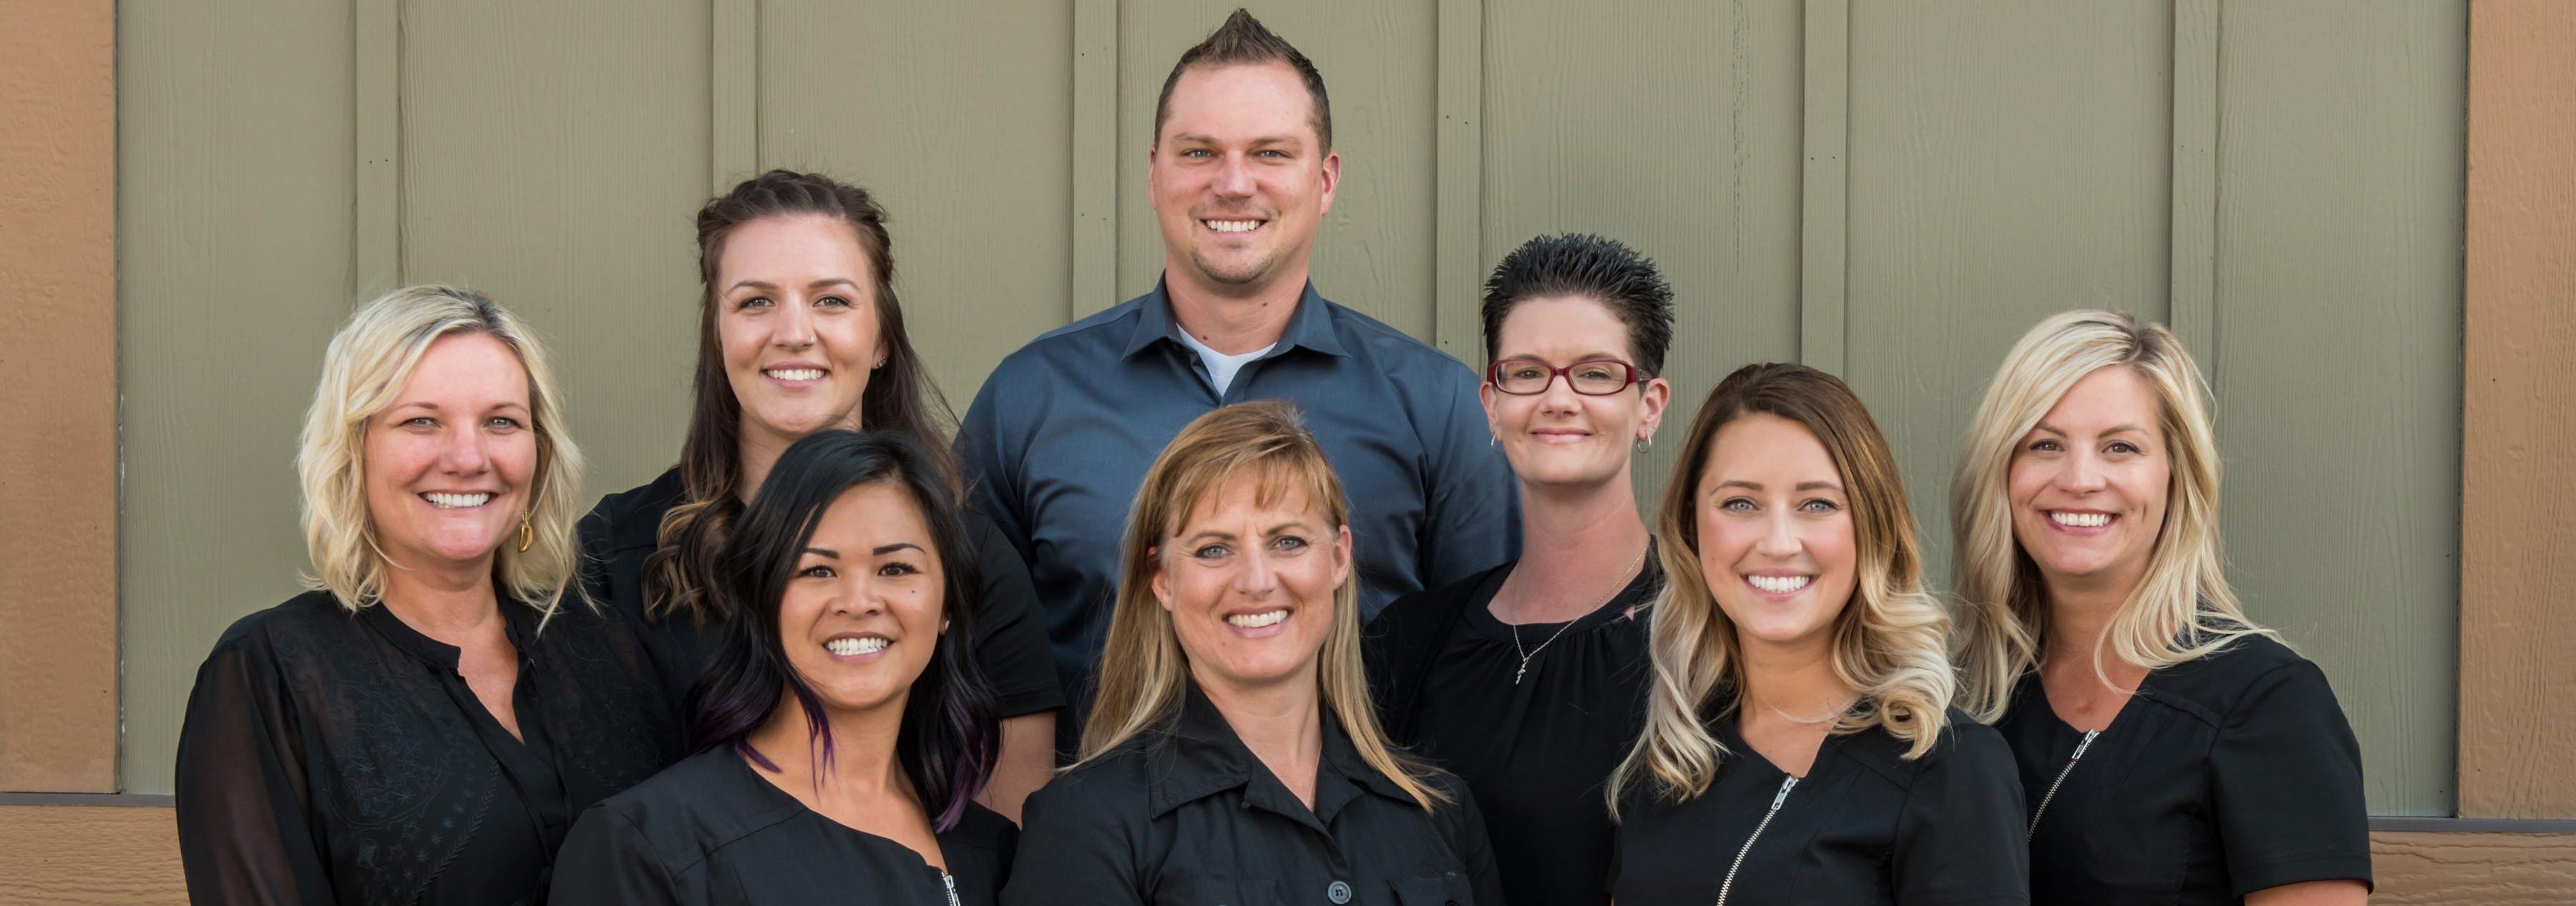 calgary-dental-360-team